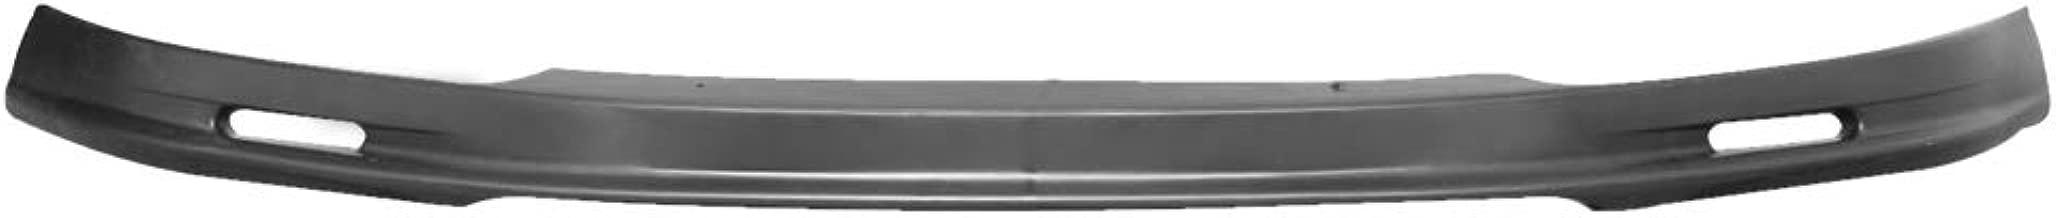 Front Bumper Lip Compatible With 1993-1997 Honda Del Sol JDM Black PP - Polypropylene Spoiler Splitter Valance Fascia Cover Guard Protection Conversion by IKONMOTORSPORTS | 1994 1995 1996